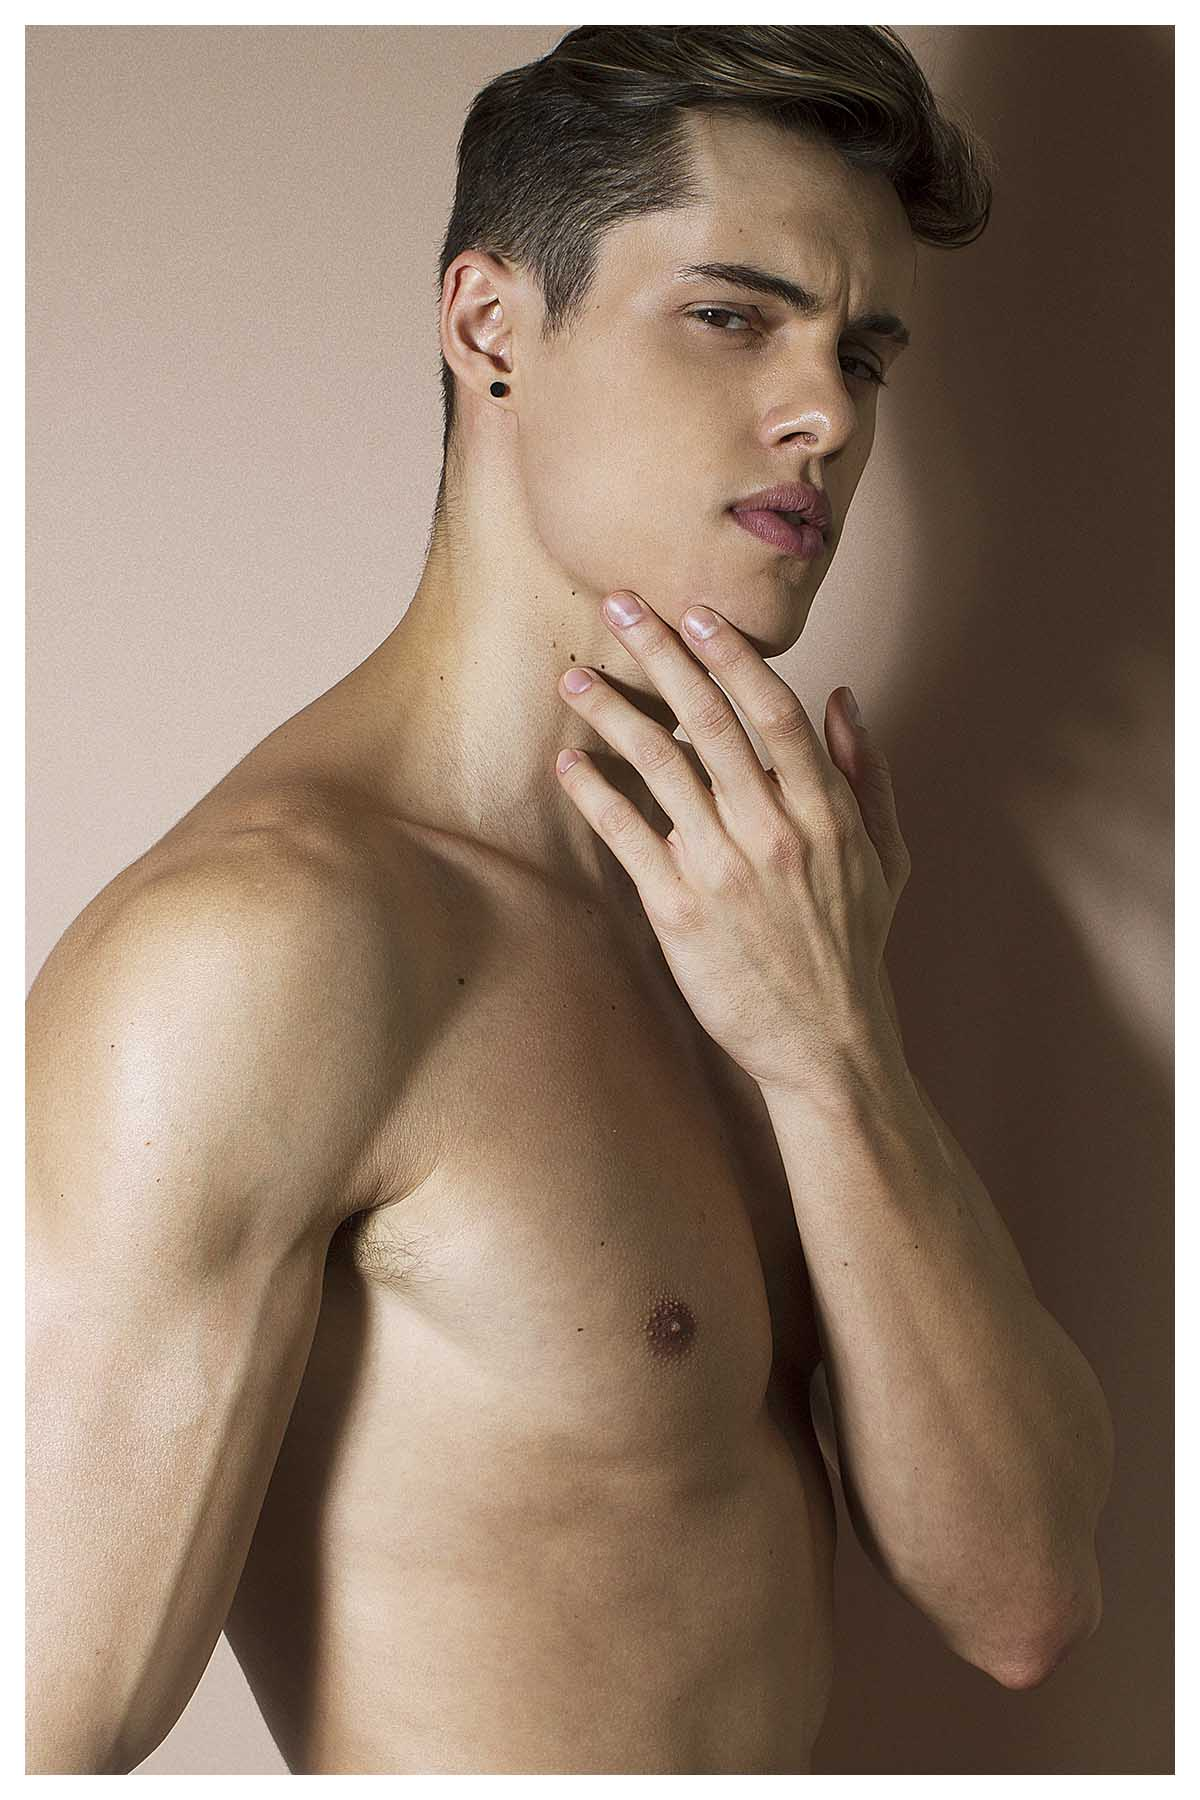 Augusto Morais by Rodrigo Moura for Brazilian Male Model